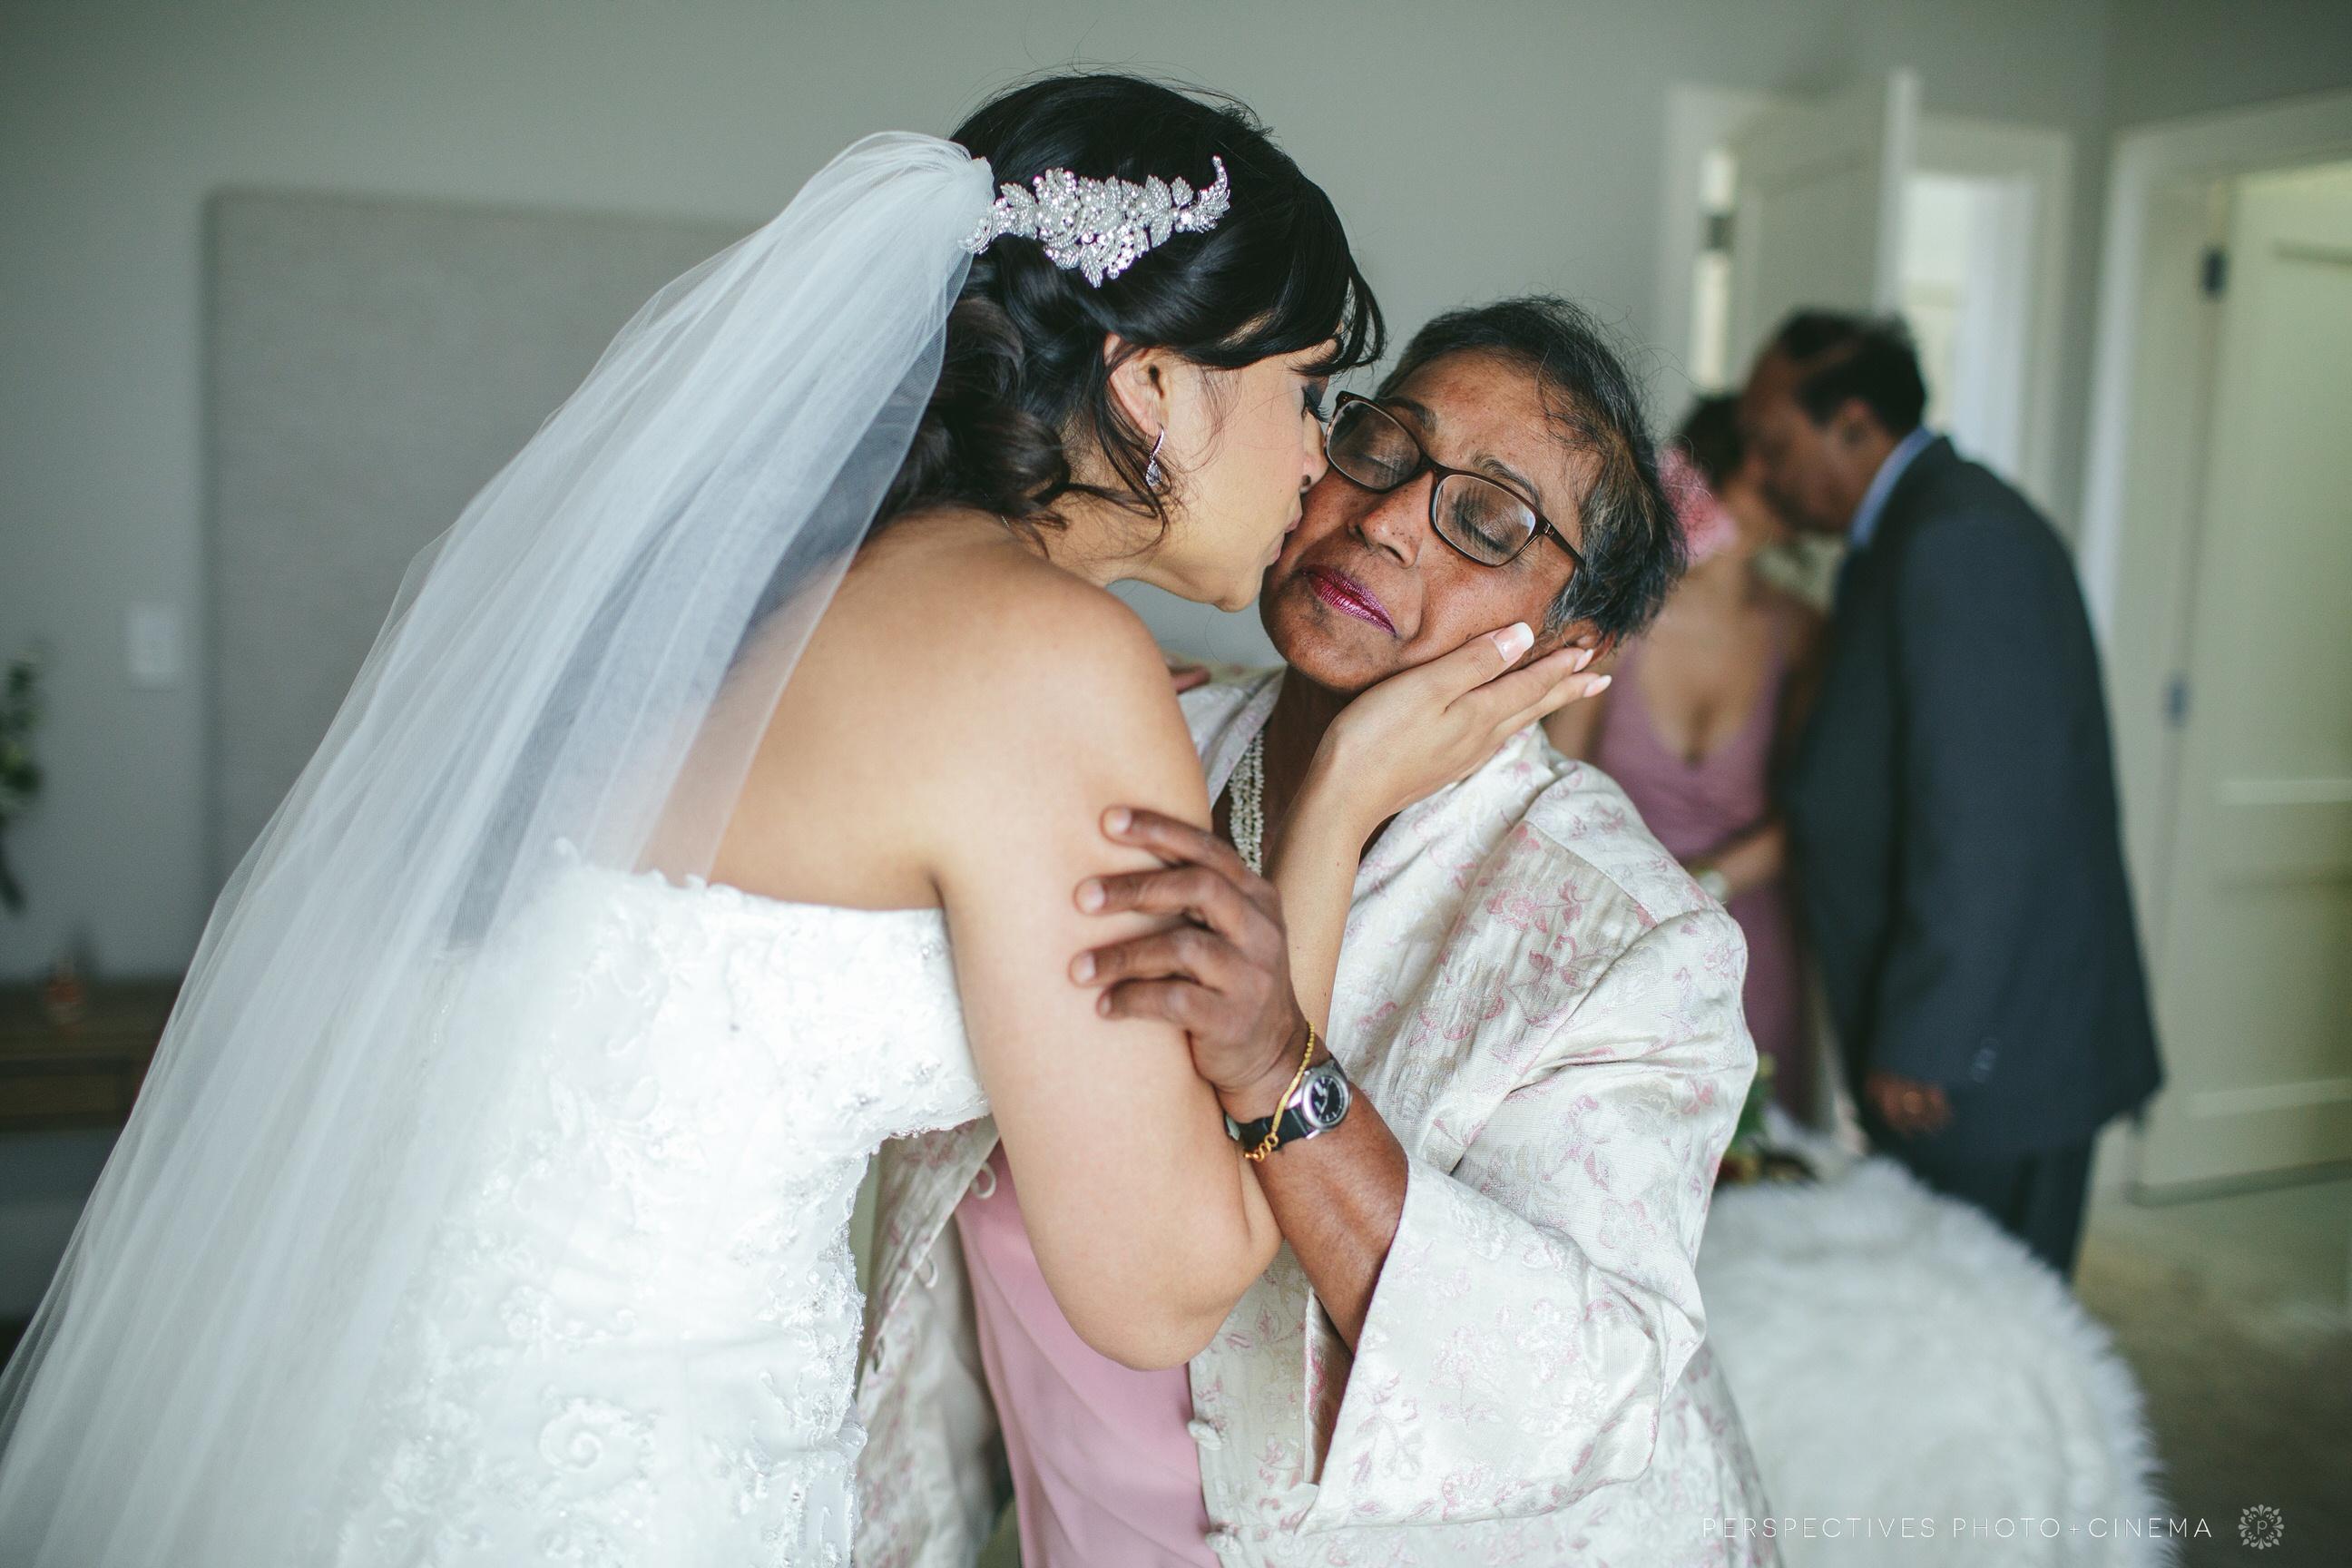 Mudbrick wedding photos